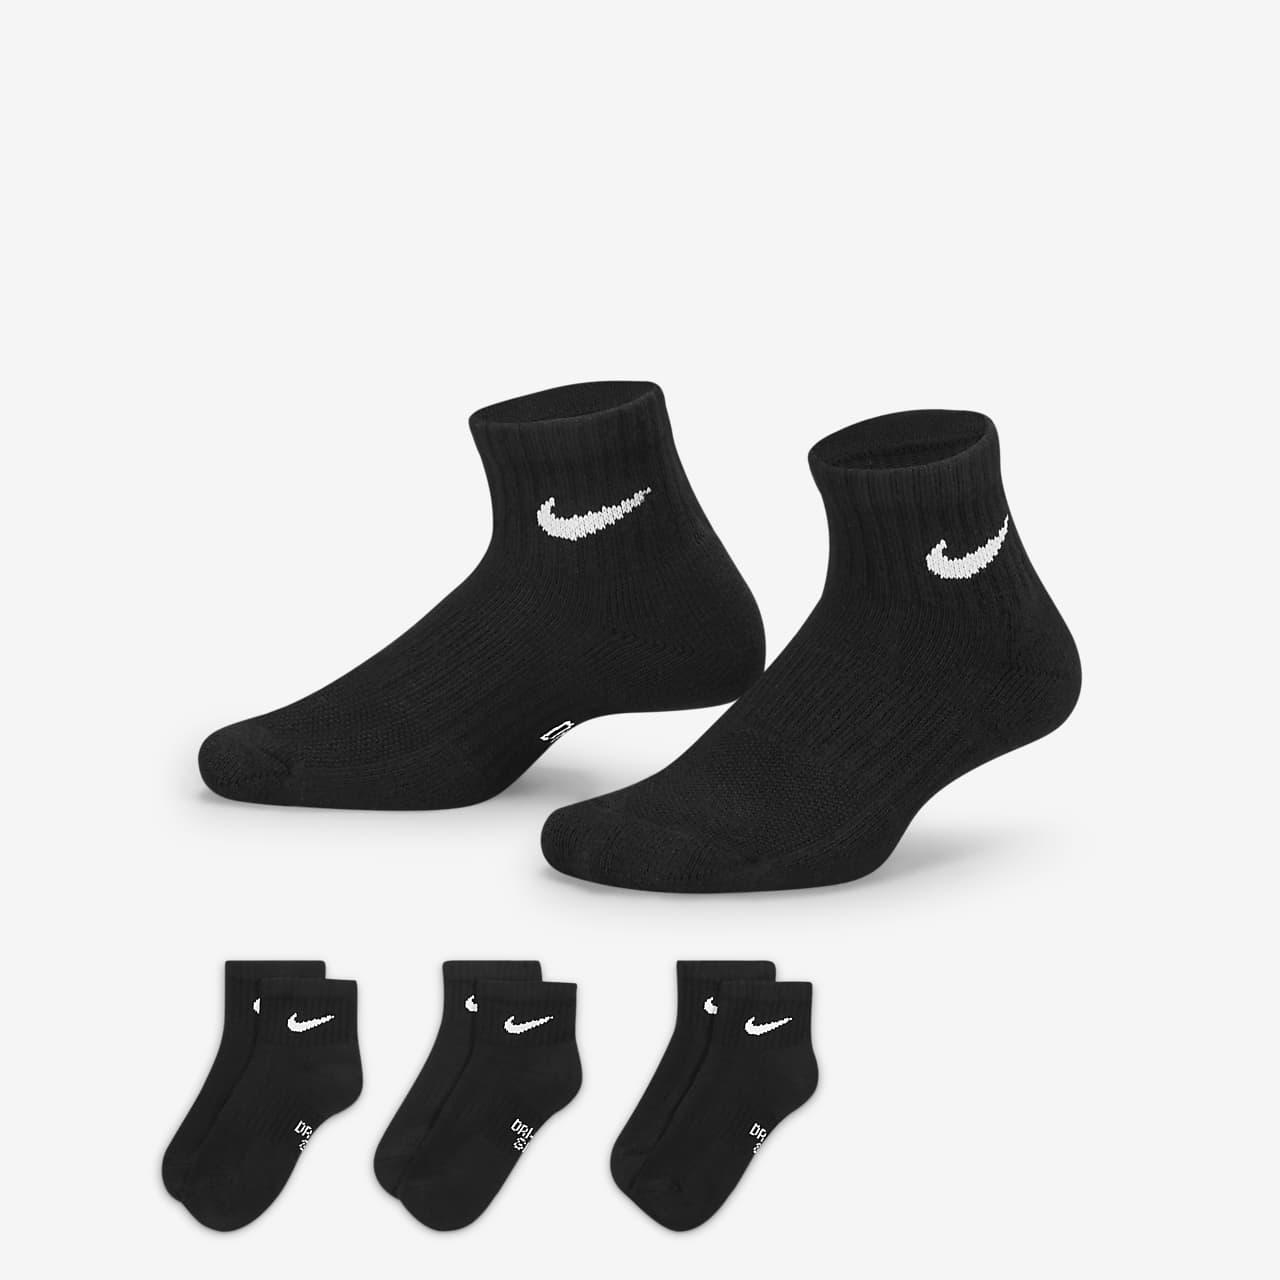 Nike Everyday Older Kids' Cushioned Ankle Socks (3 Pairs)